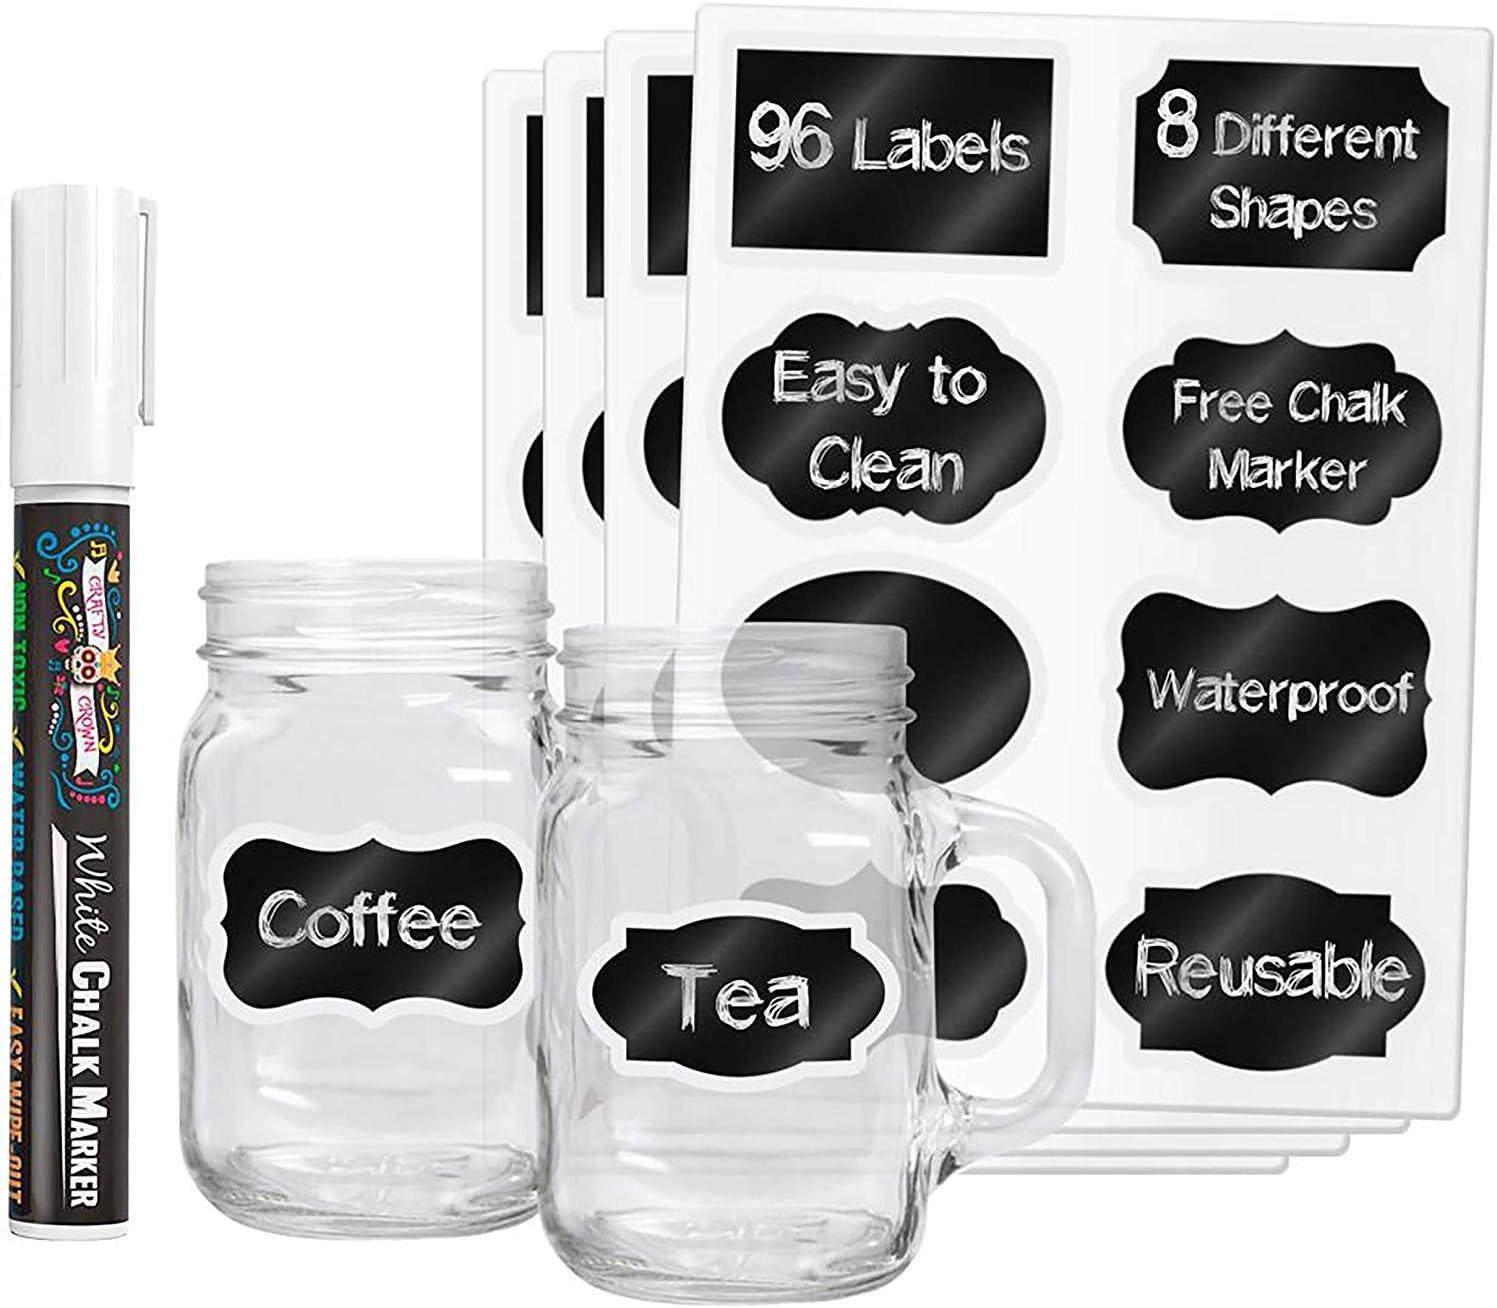 Mason Jars Glass Jars 150Pcs Reusable Blackboard Labels with 2 Pens KDWLL Chalkboard Labels Medium Waterproof Chalkboard Stickers with Lace for Storage Bins